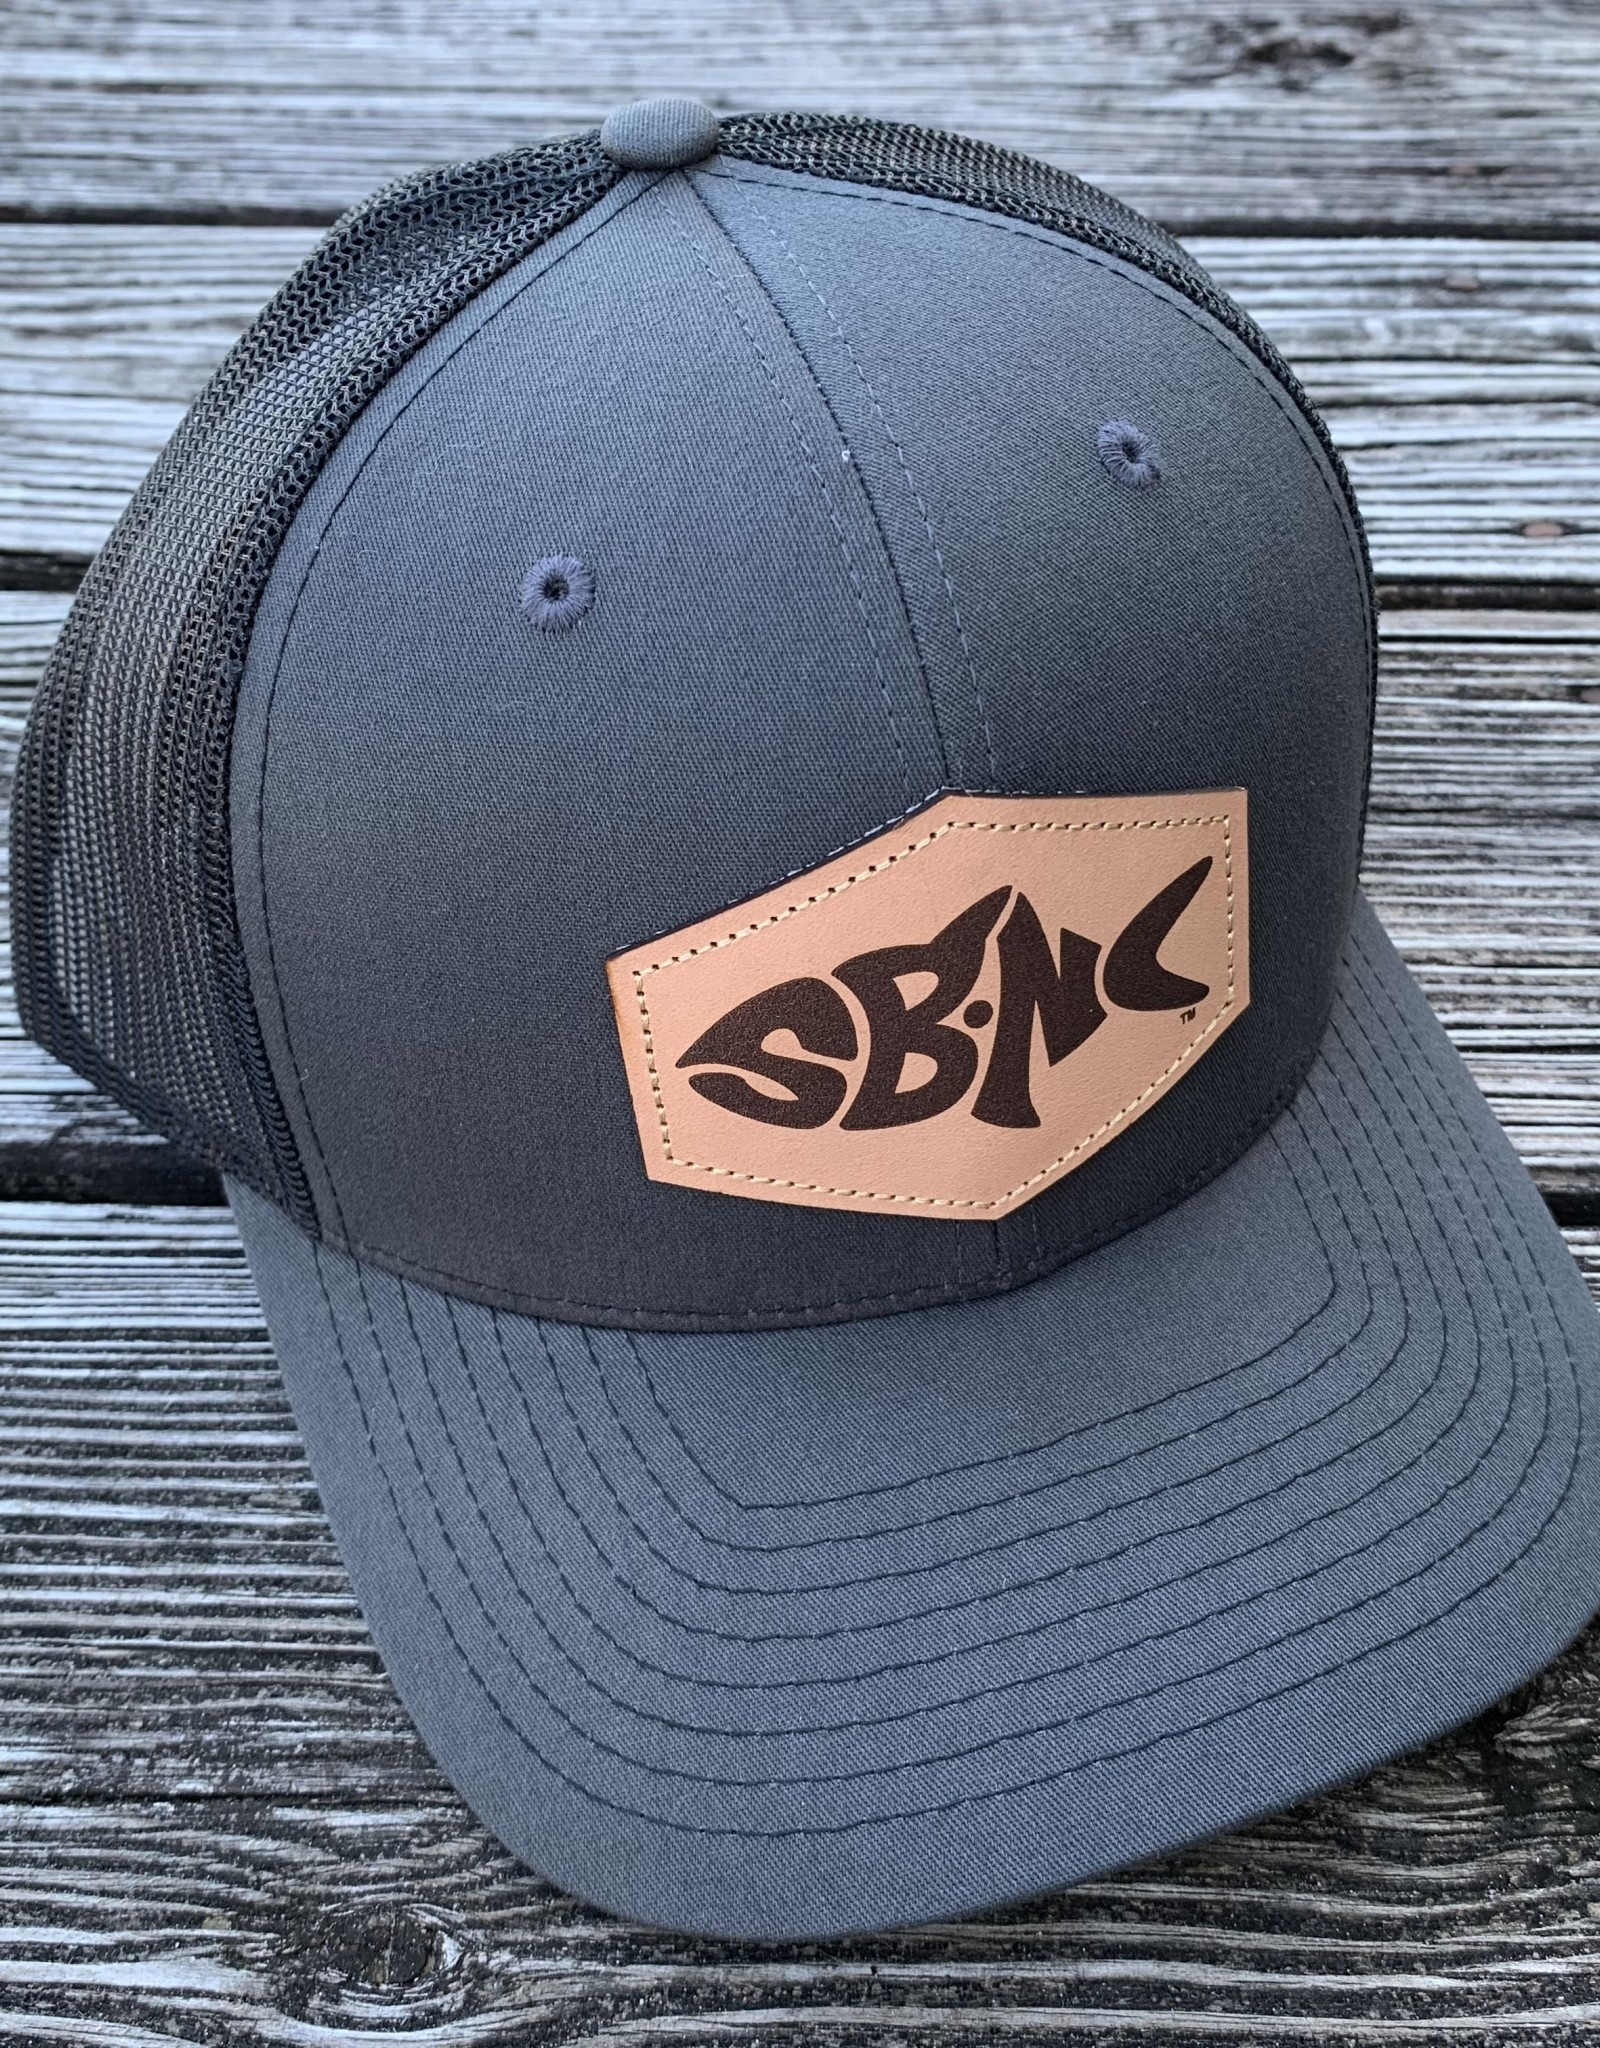 sbncfish SBNC FISH PATCH CAP CHAR/BLK